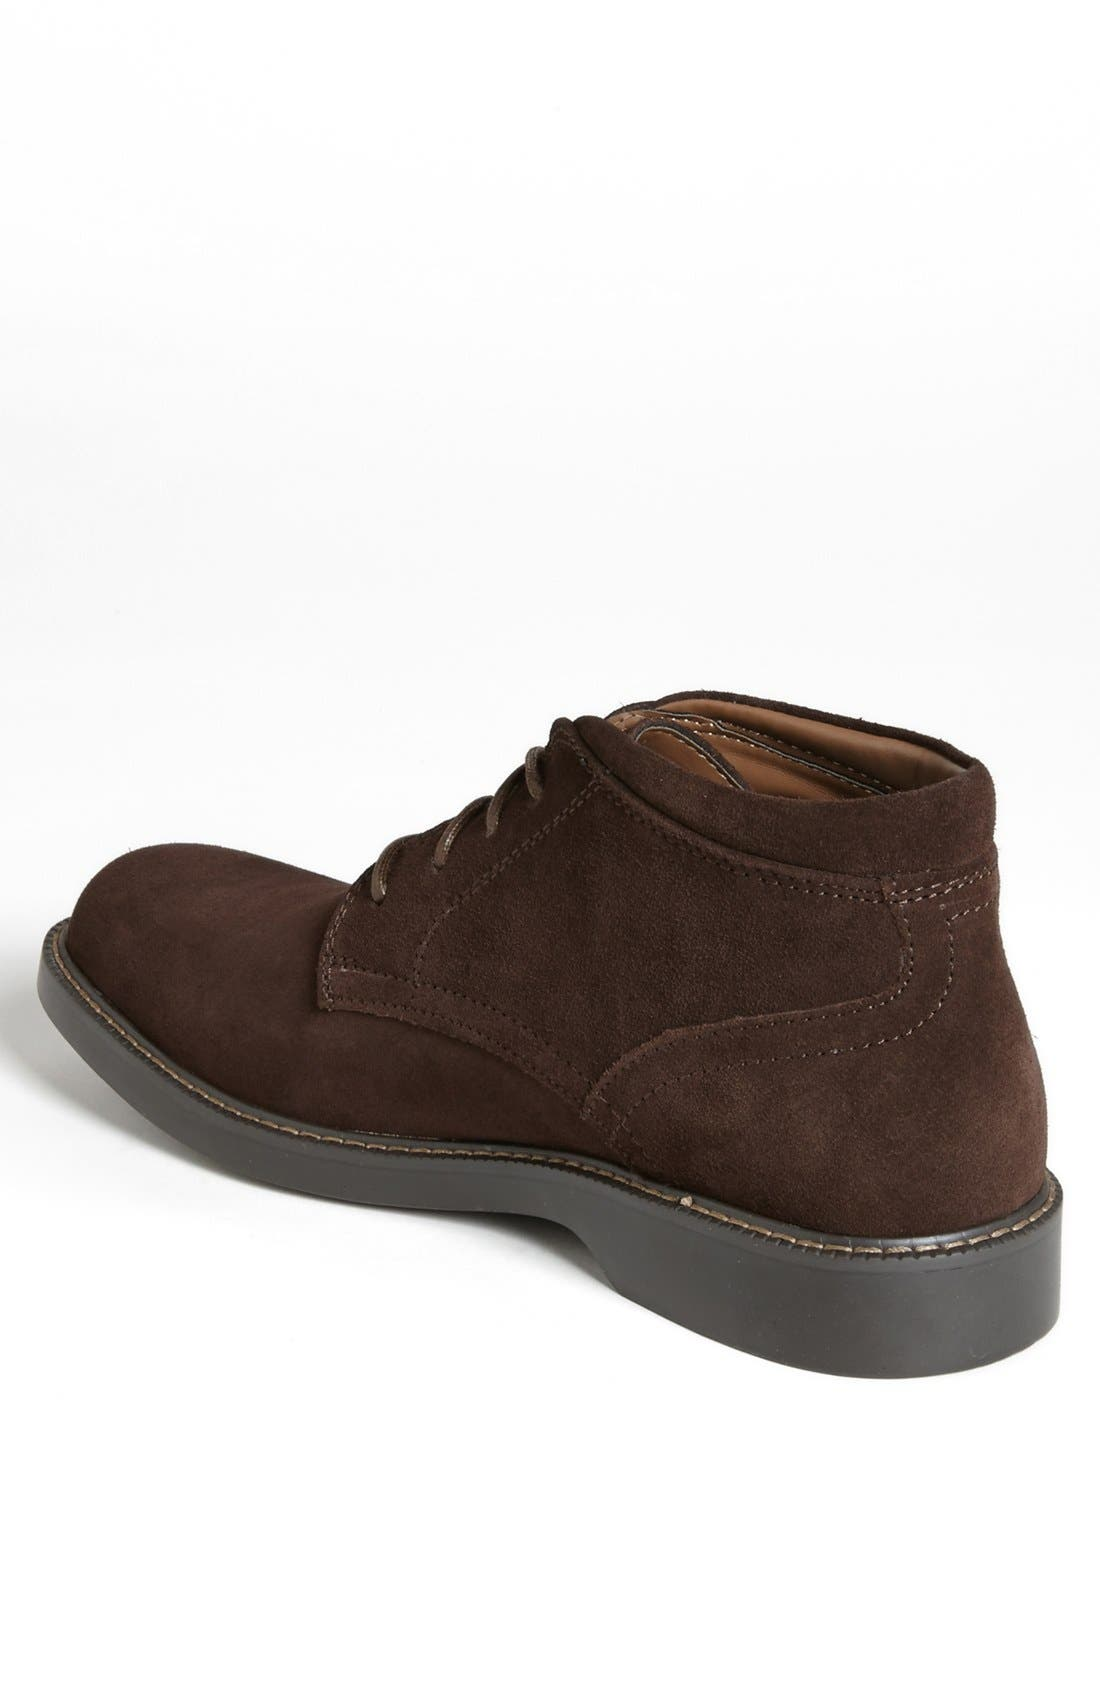 Alternate Image 2  - G.H. Bass & Co. 'Plano' Plain Toe Boot